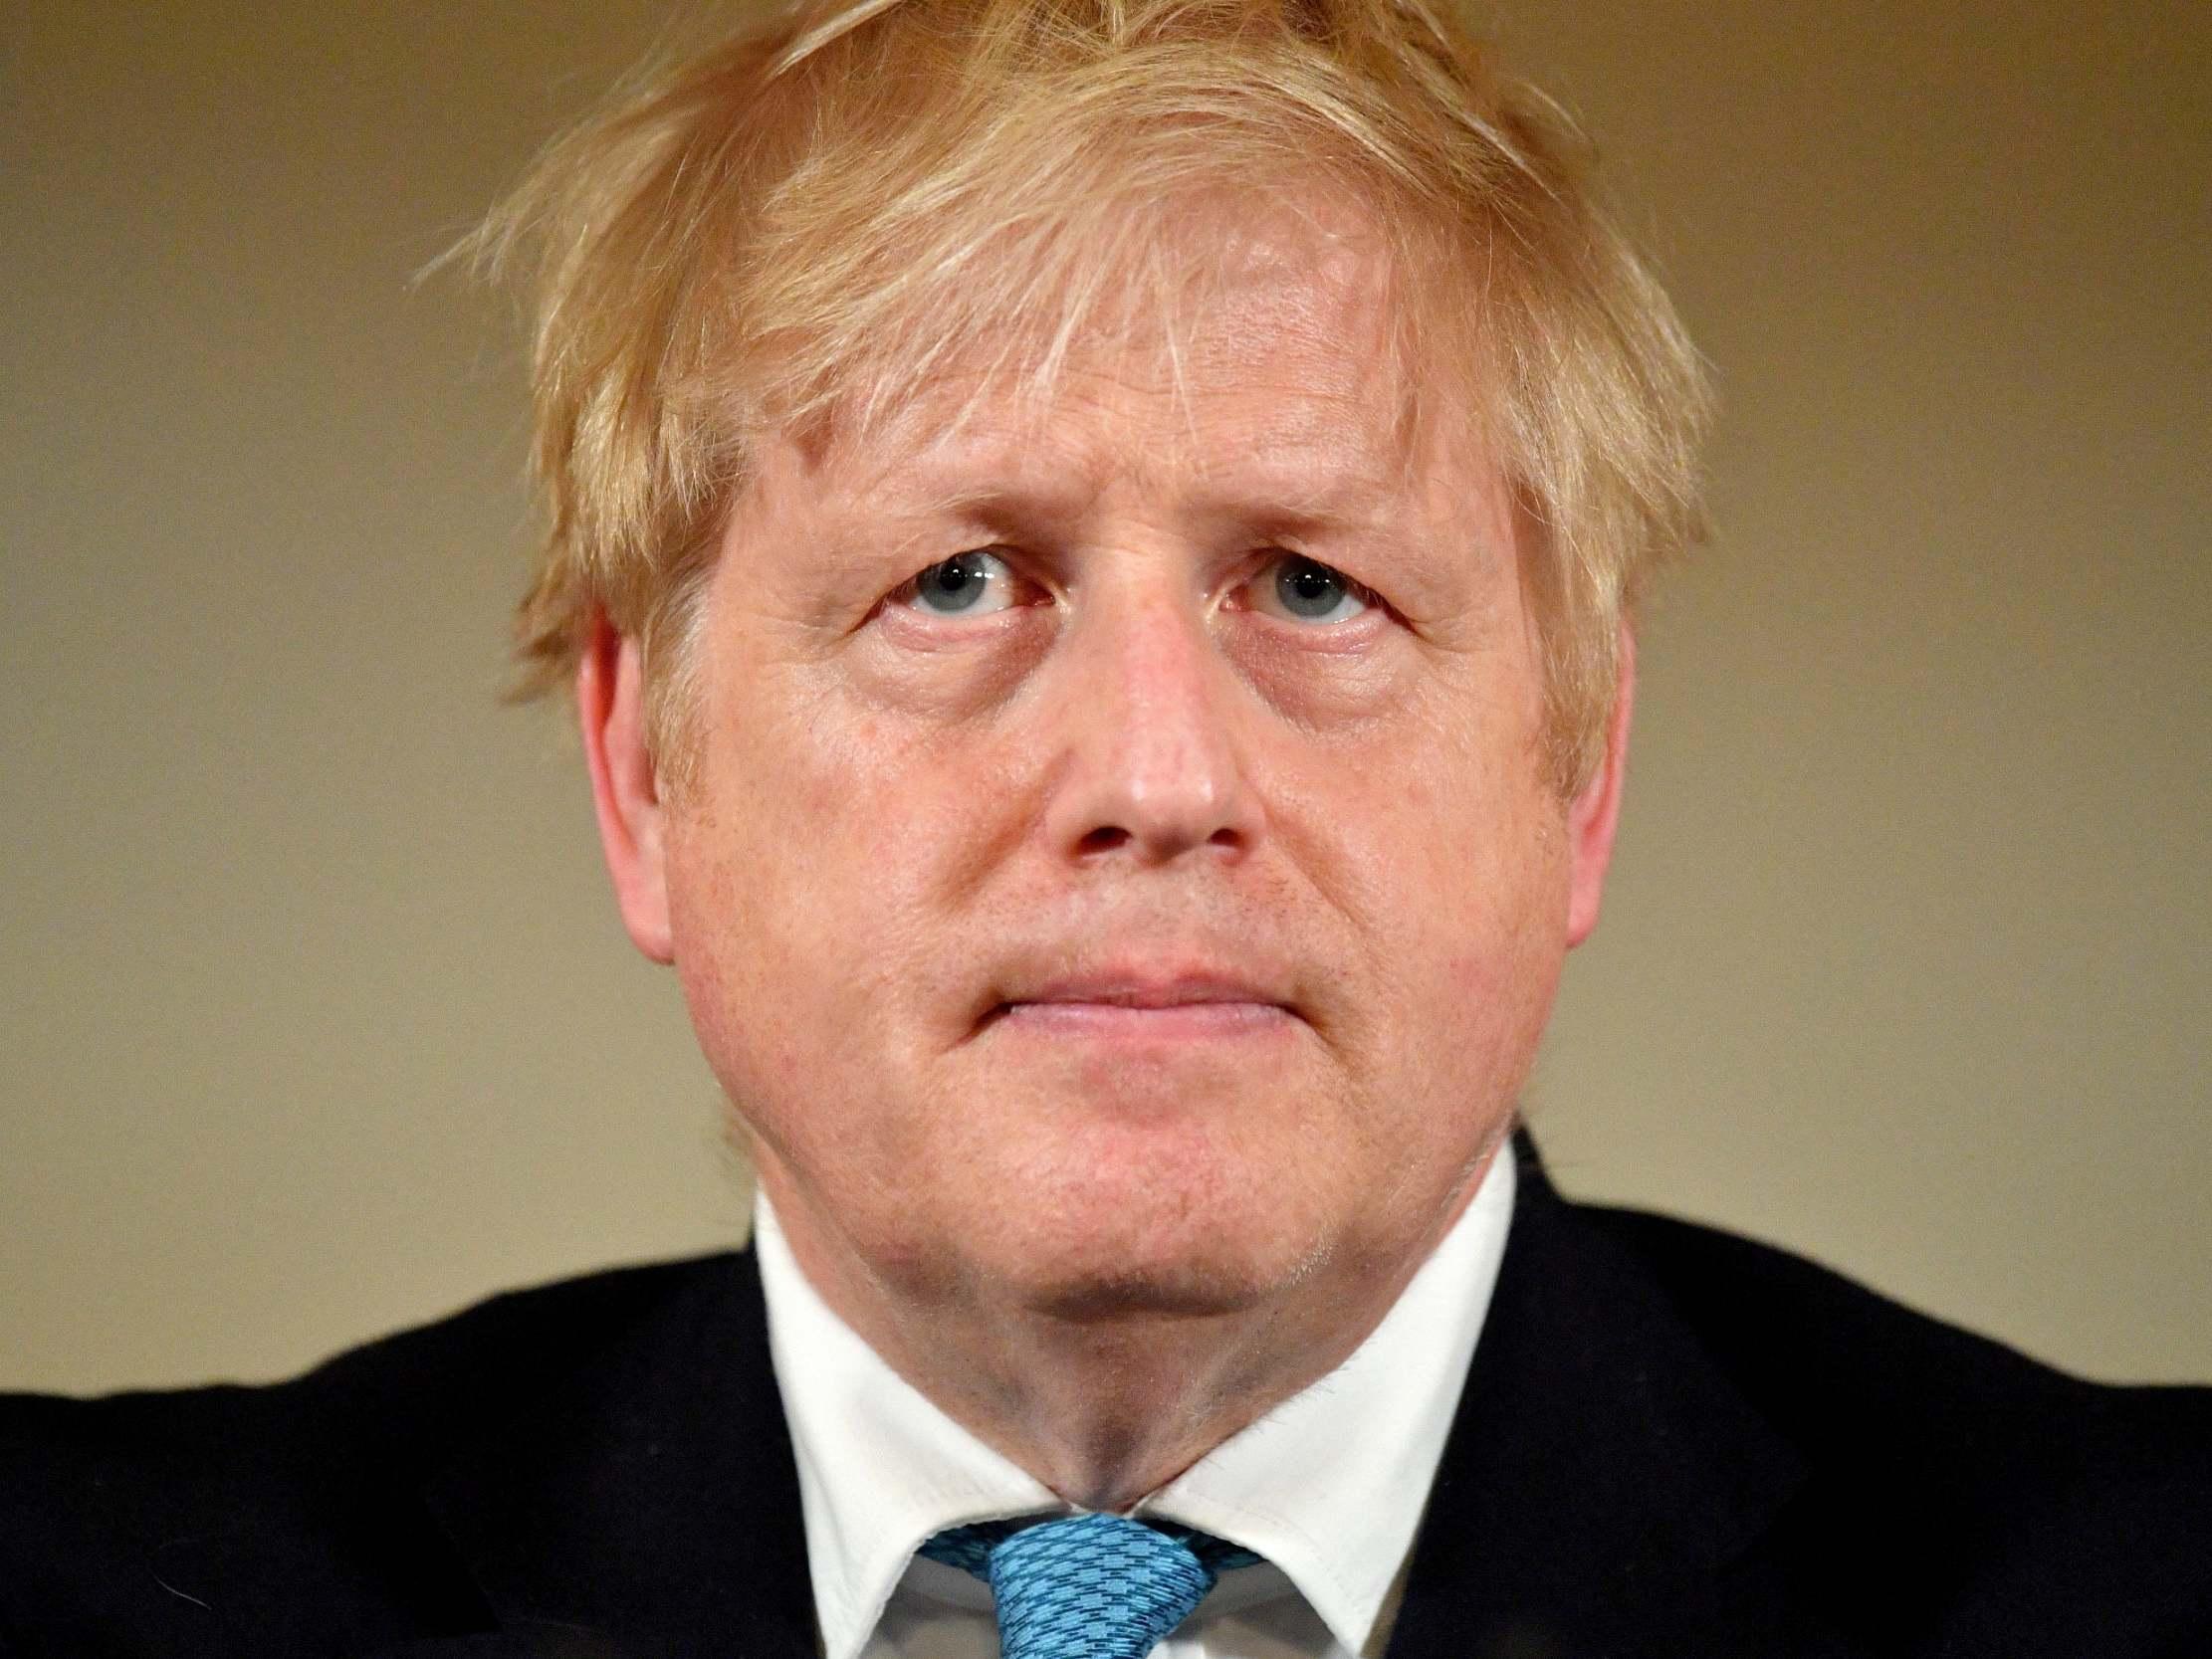 Coronavirus: The tests Boris Johnson will be undergoing in hopsital